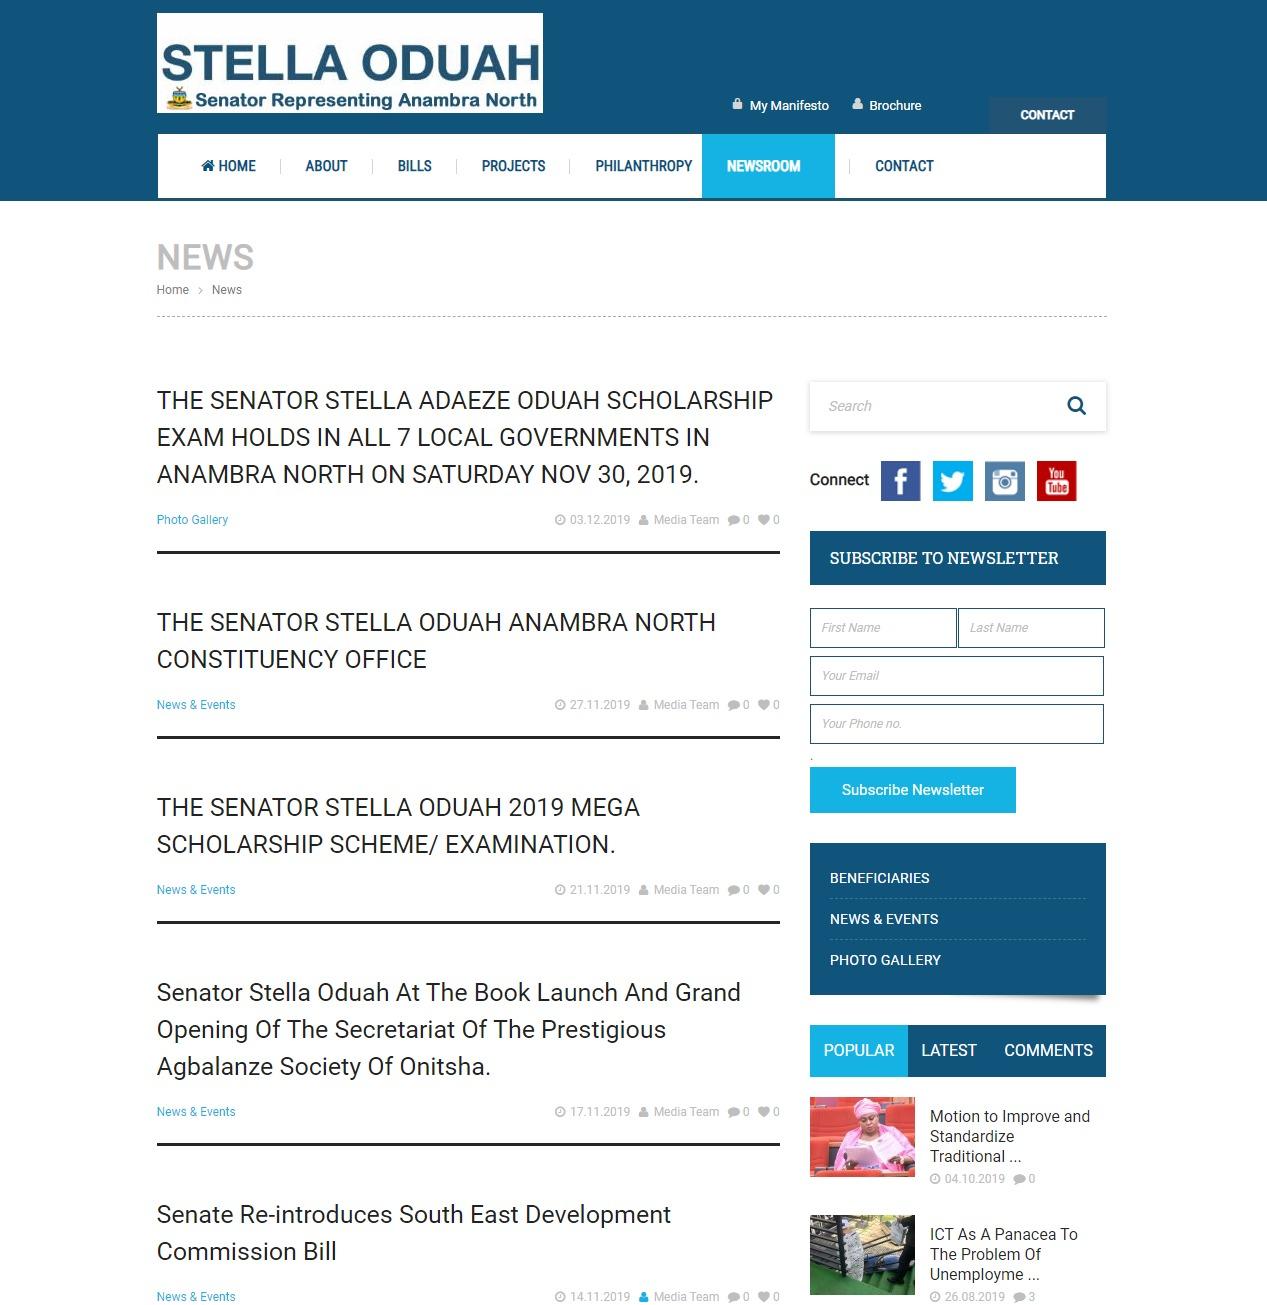 Senator Stellah Oduah Website